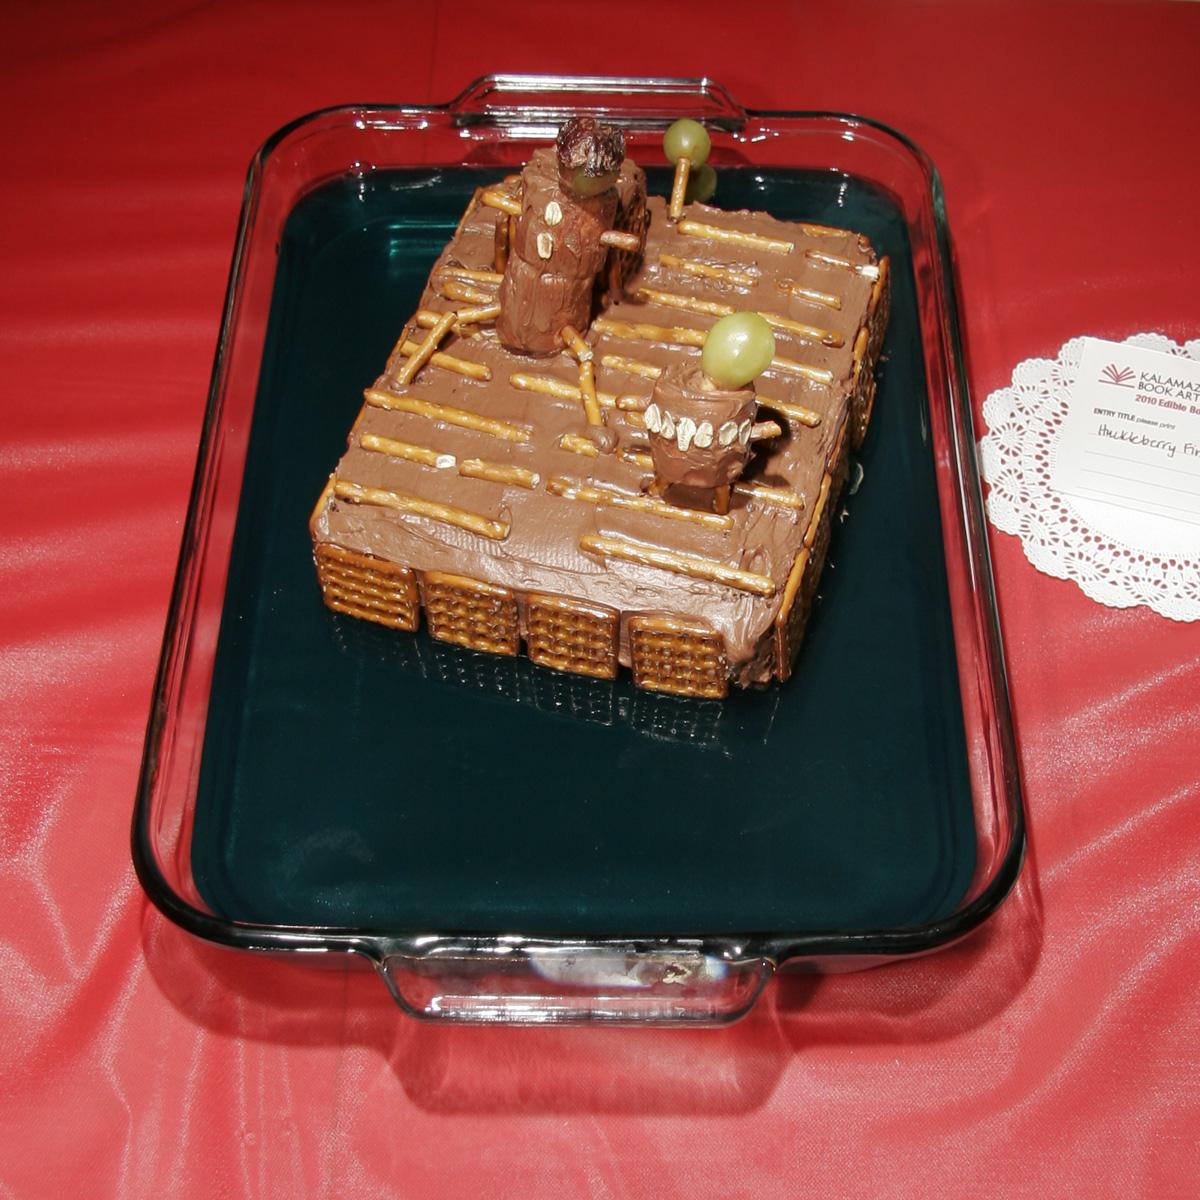 """Huckleberry Finn"" created by Natally Bones & Nevada Rickert, 2010 KBAC Edible Book Festival"